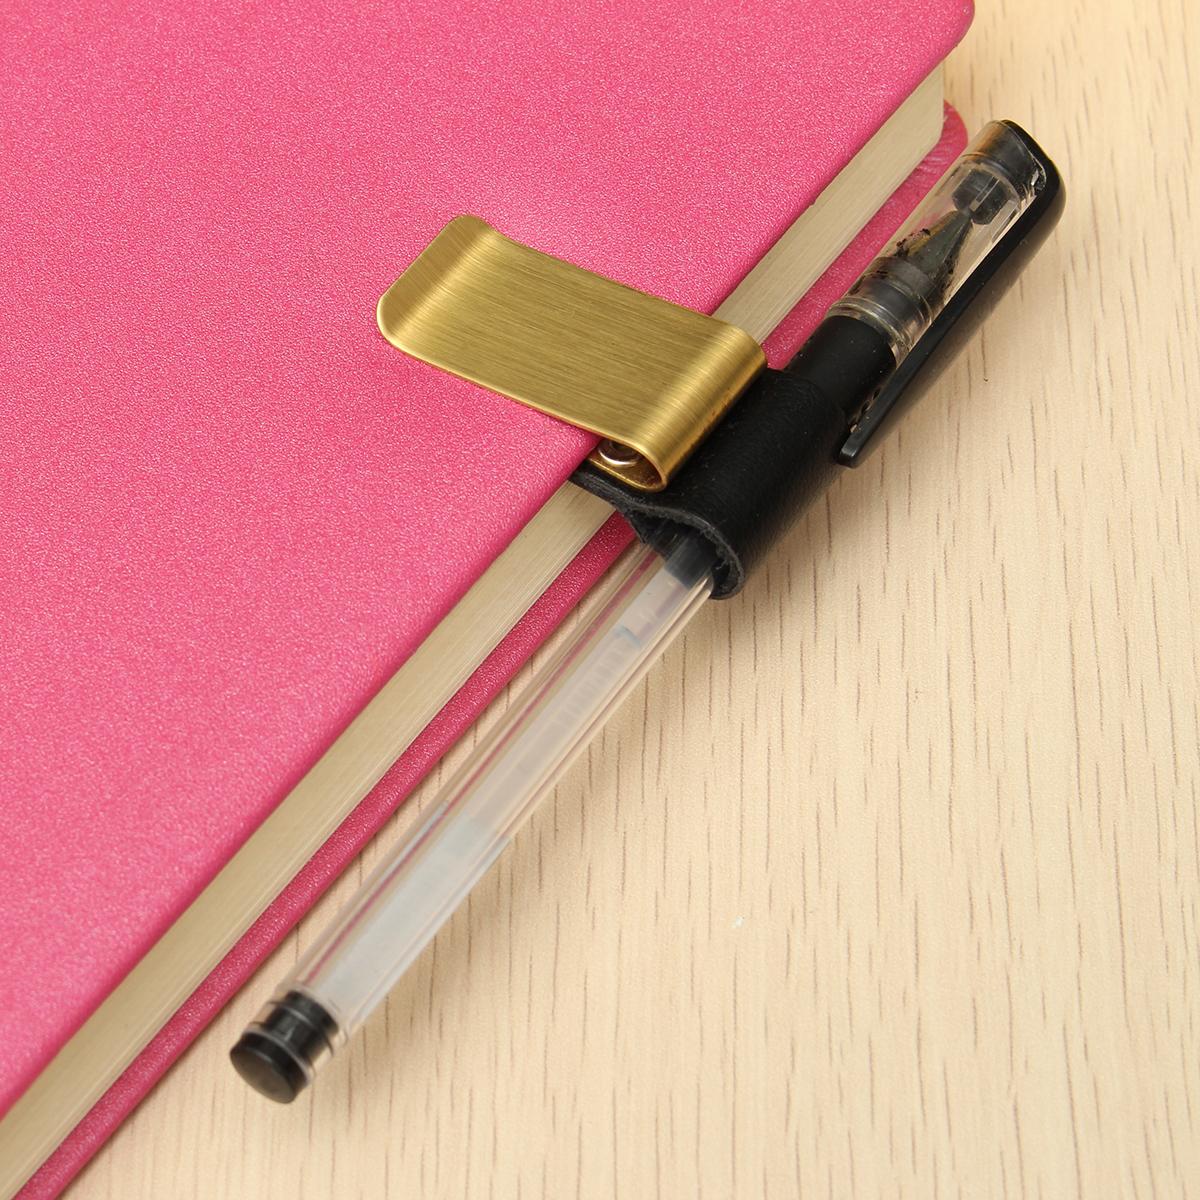 Stainless Steel Leather Notebook Clip Metal Pen Holder Paper Folder